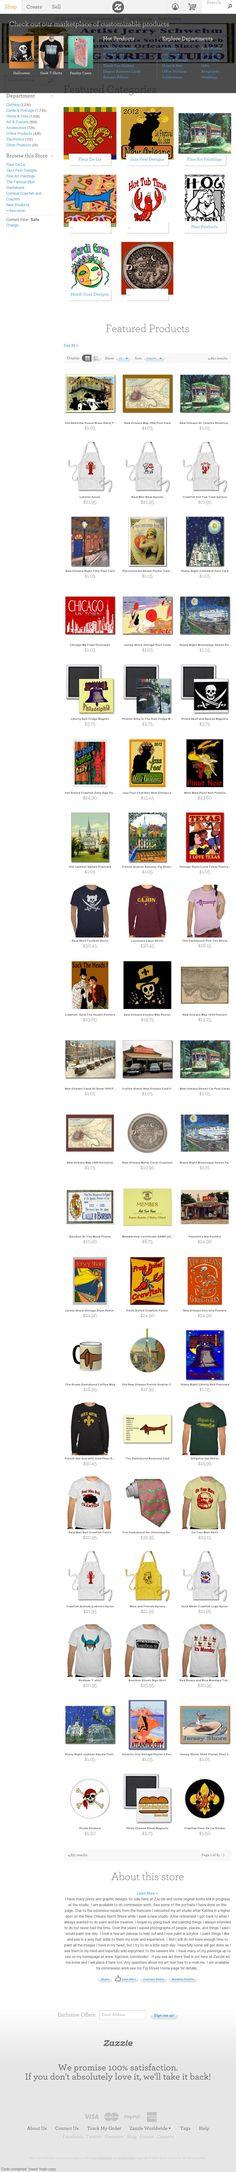 Jerry Schwehm, New Orleans artist sells art on the web. --The website 'http://www.zazzle.com/figstreetstudio' courtesy of @Pinstamatic (http://pinstamatic.com)